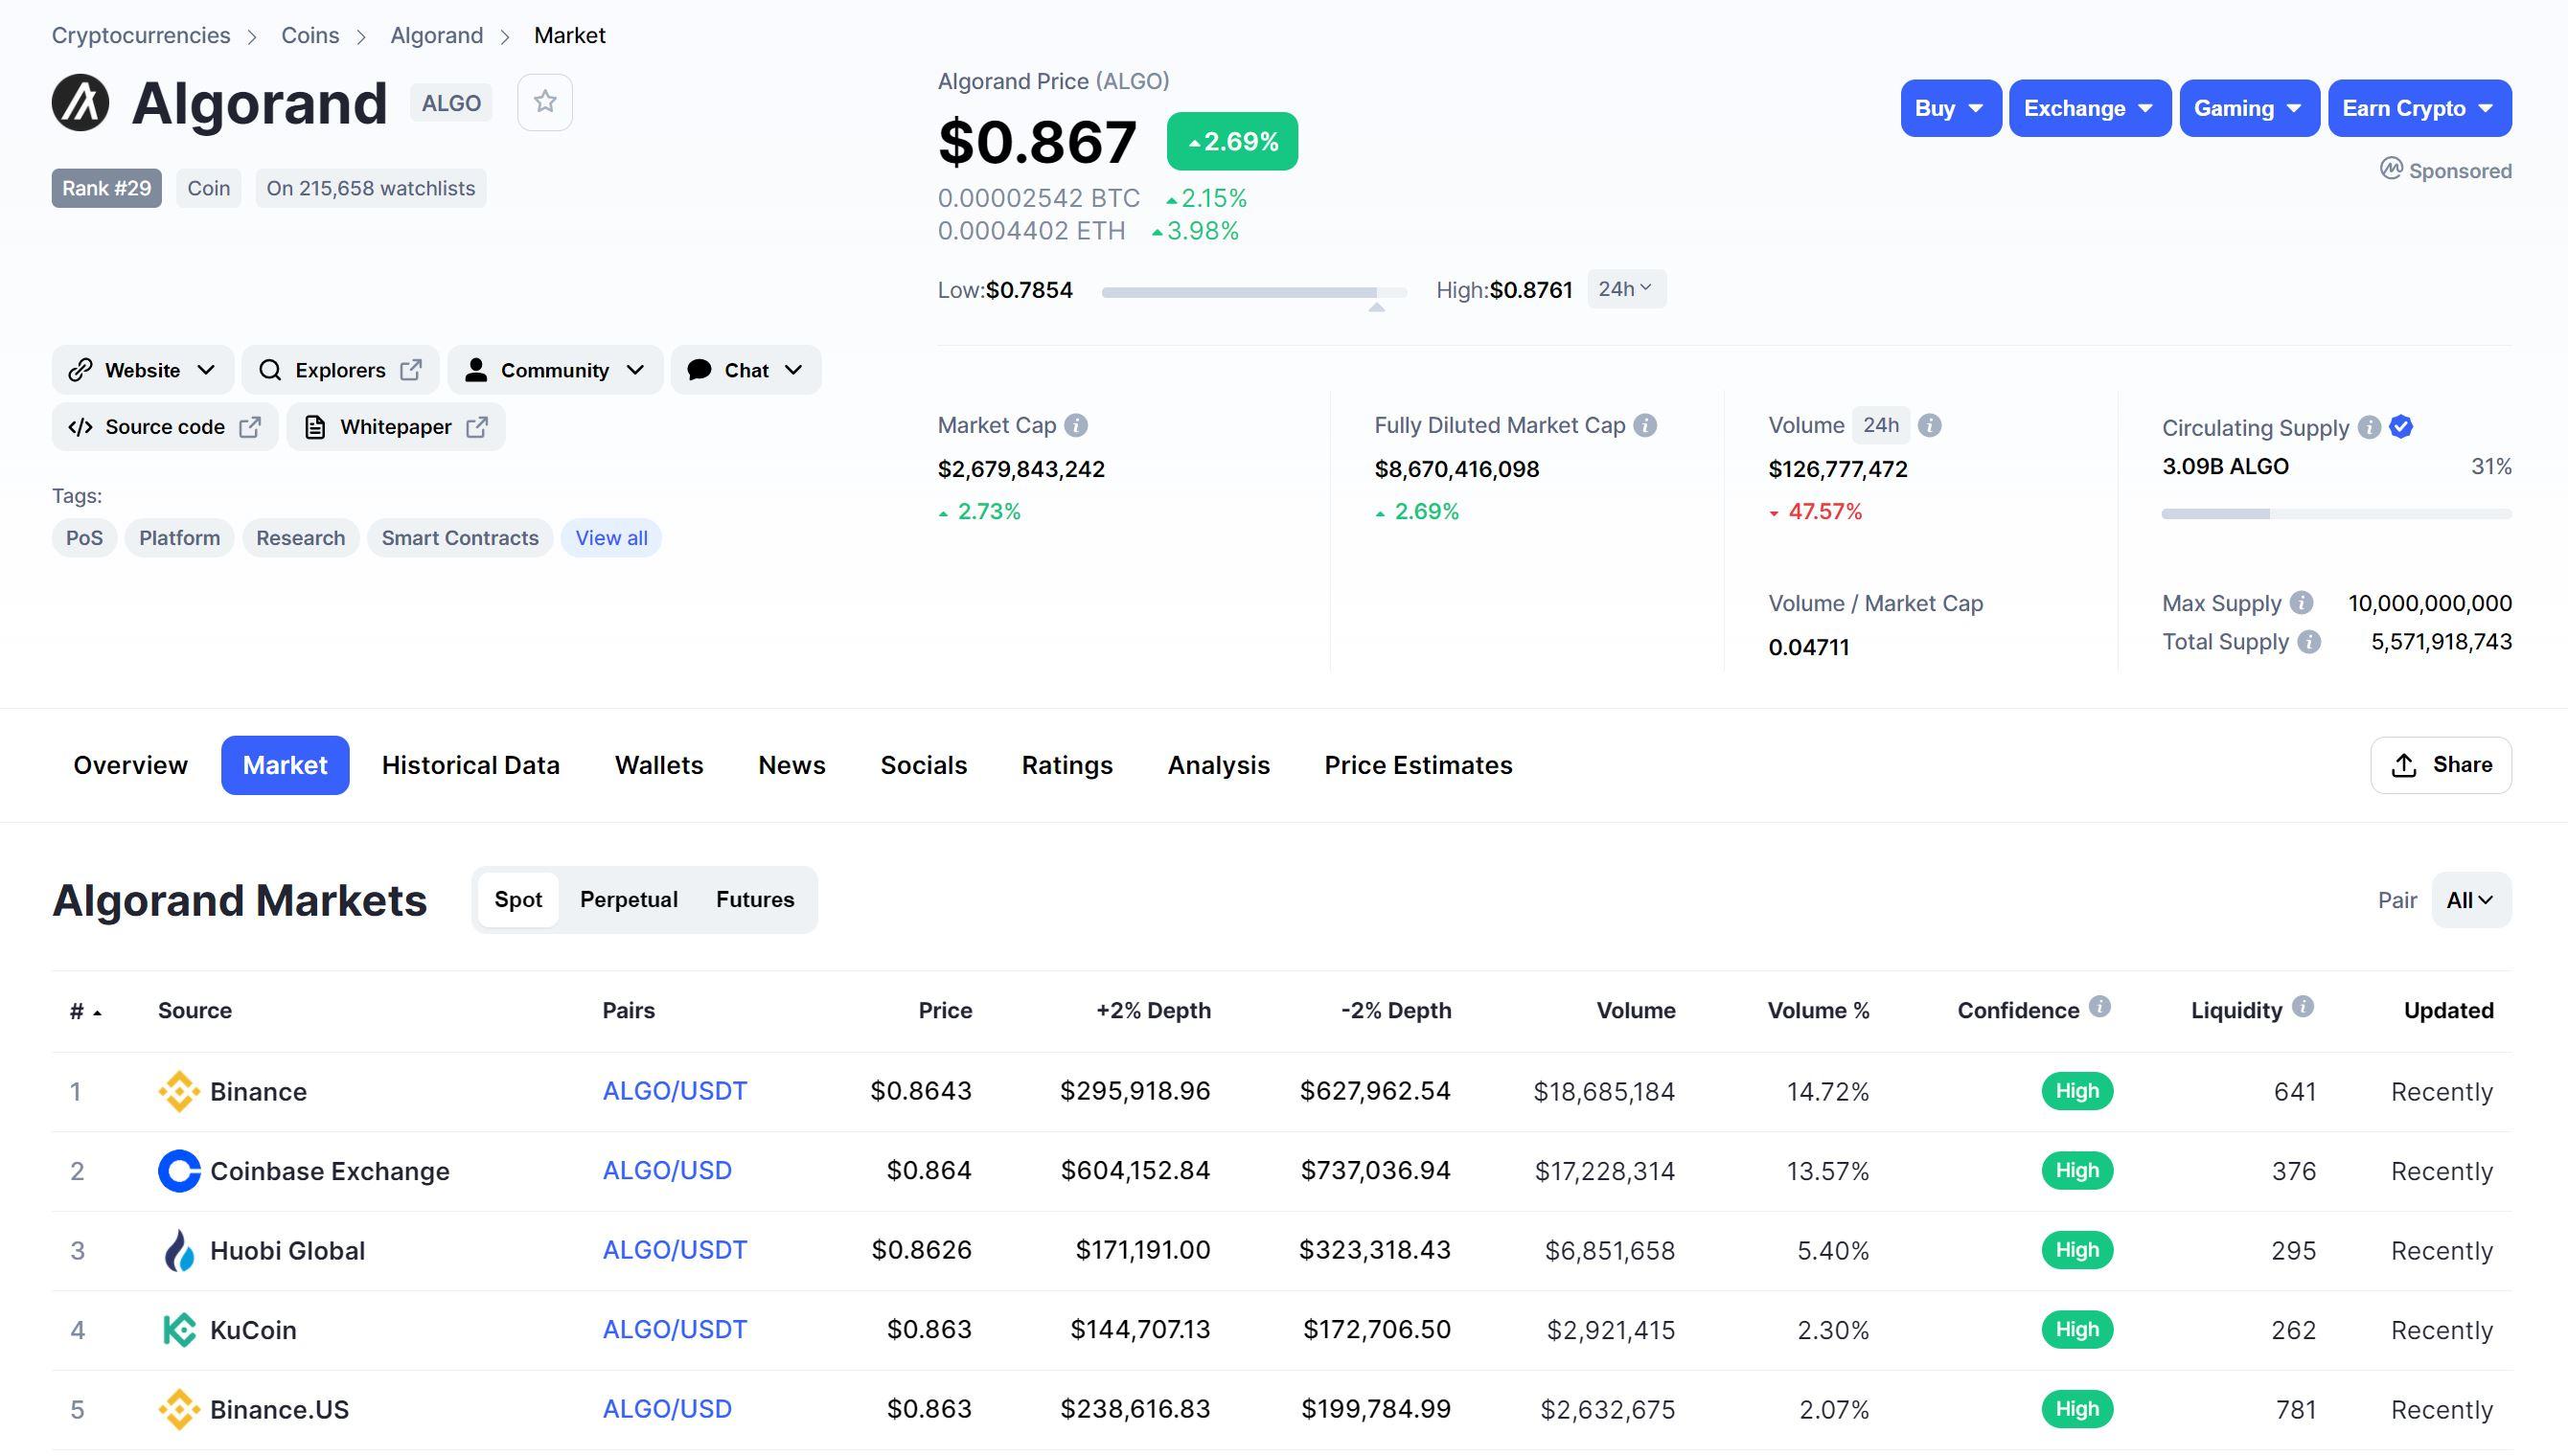 Descripción general de Algorand Markets CoinMarketCap